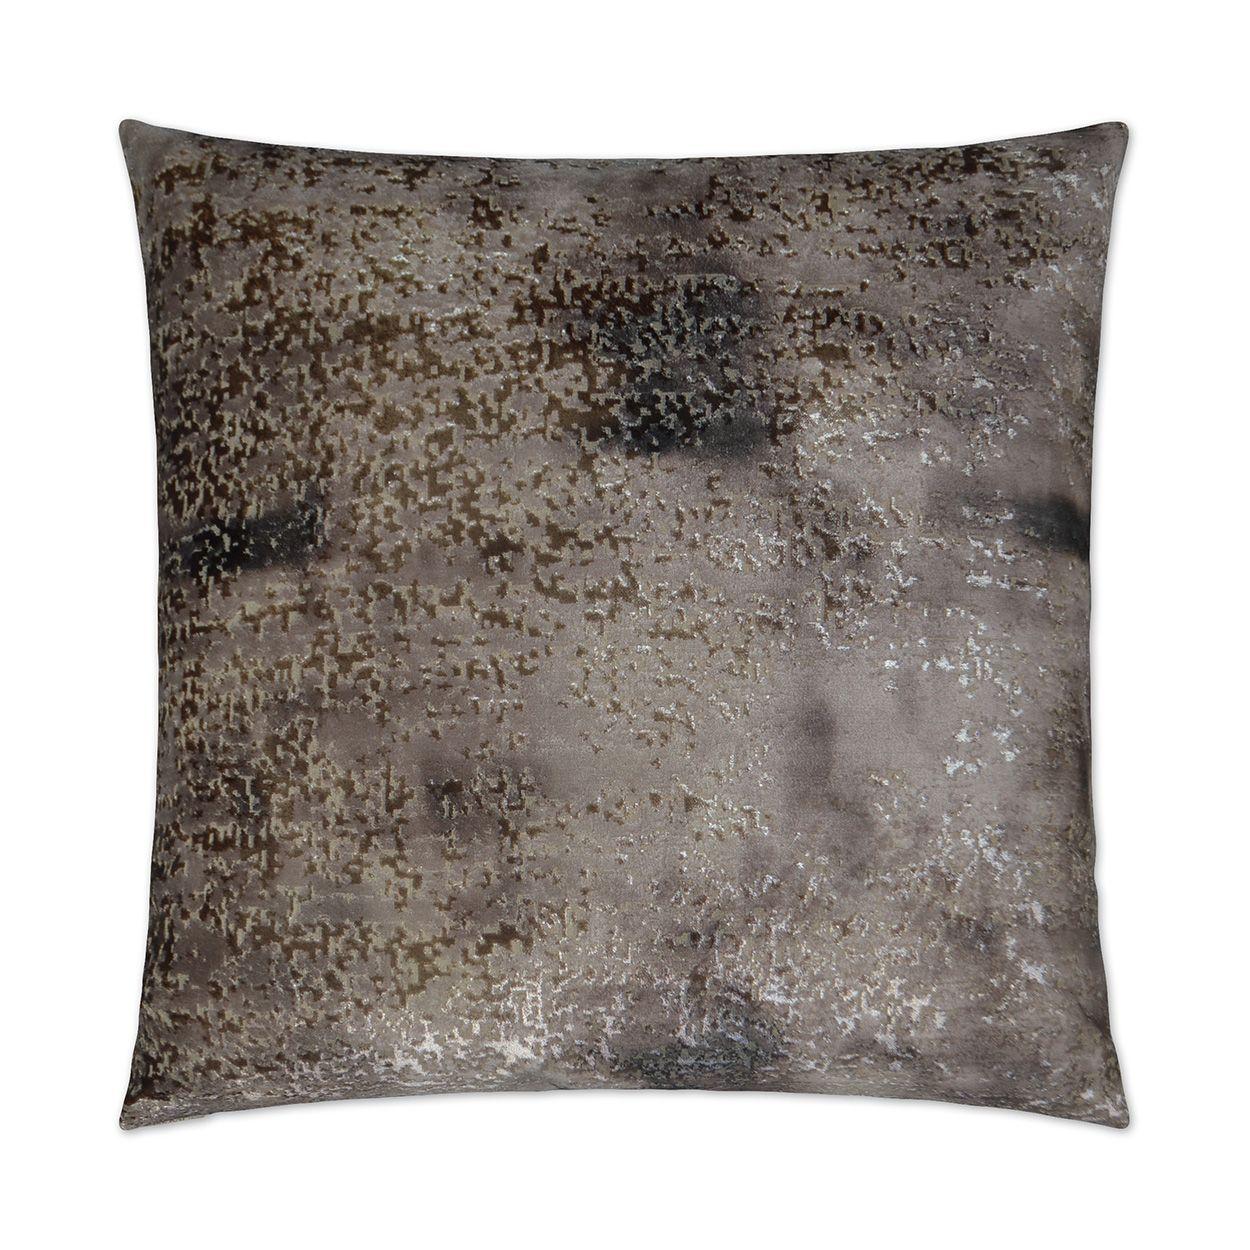 Crater Moonstone D V Kap Home Pillows Shop Decorative Pillows Classic Sheets